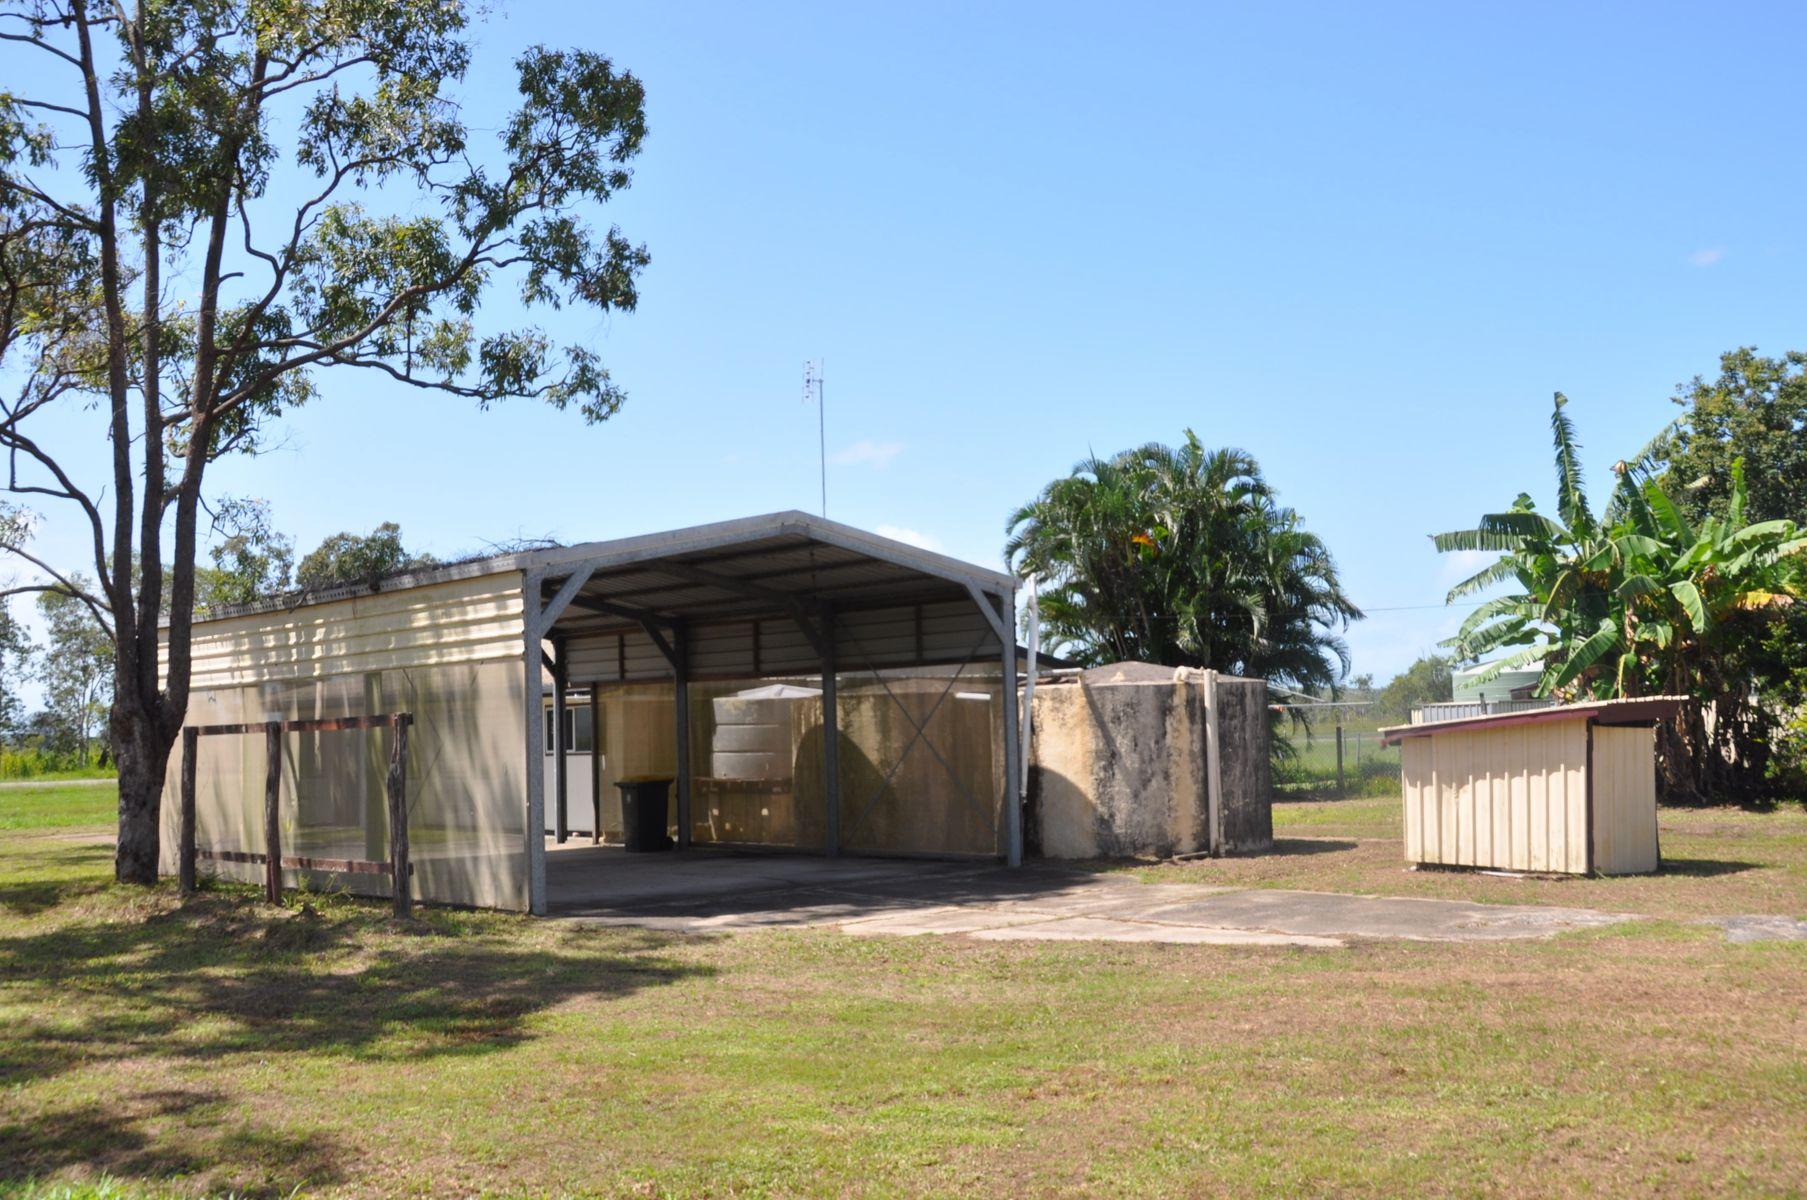 87249 Bruce Hwy, Ilbilbie, QLD 4738